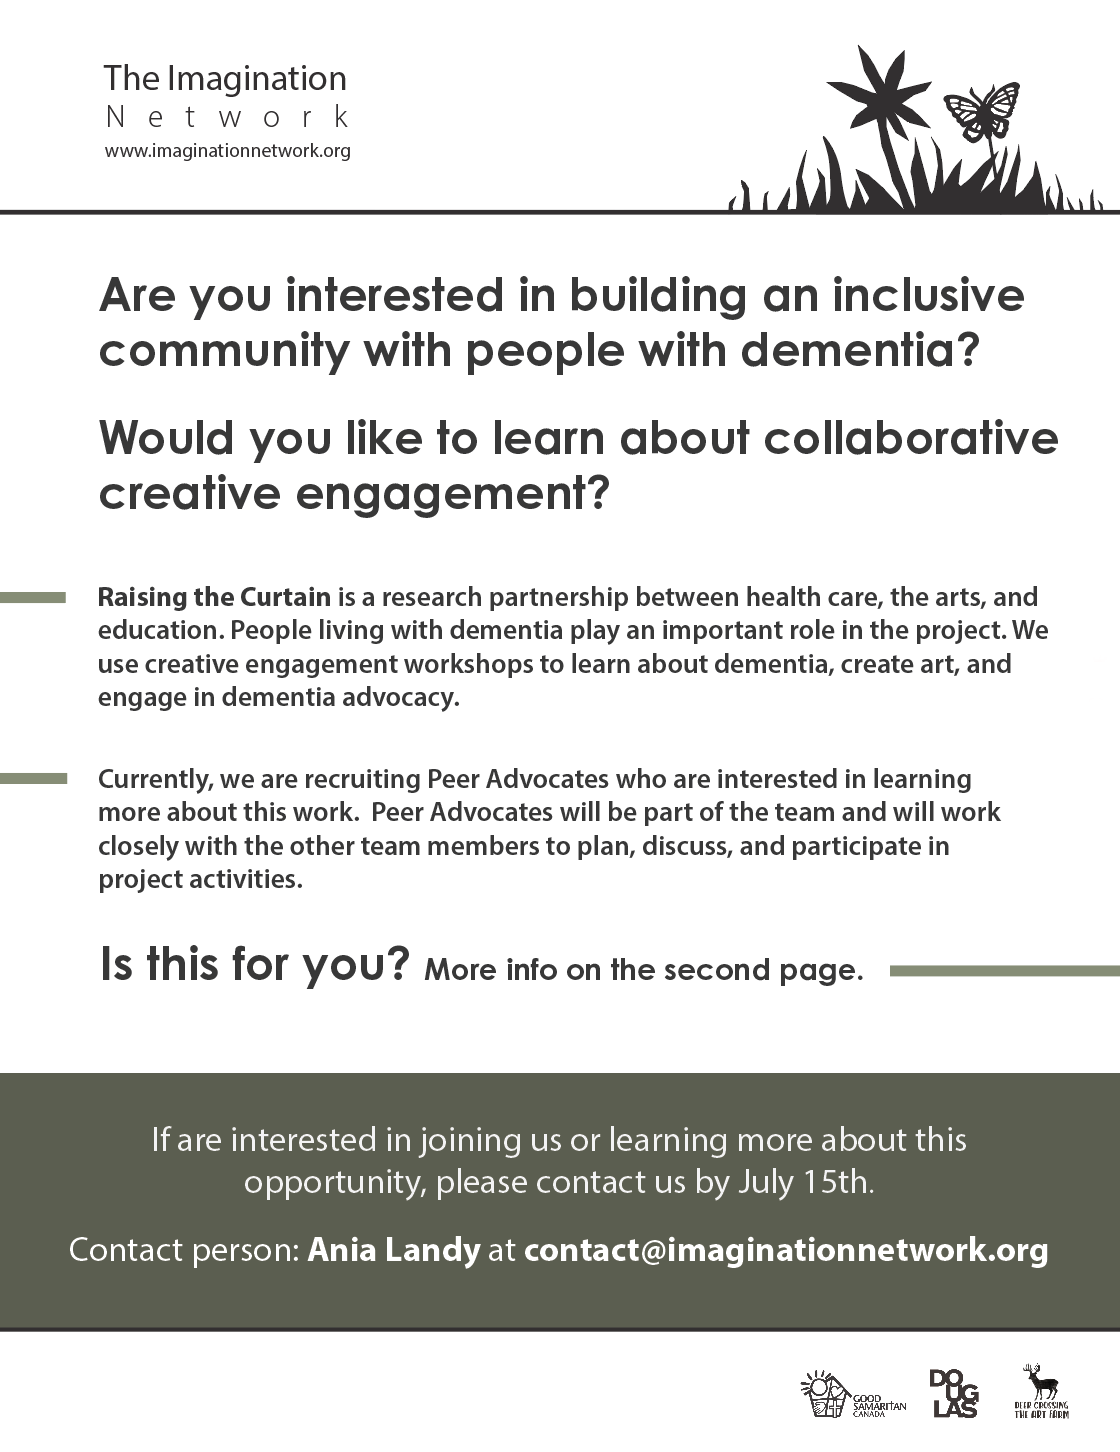 Peer advocates, individuals living with dementia